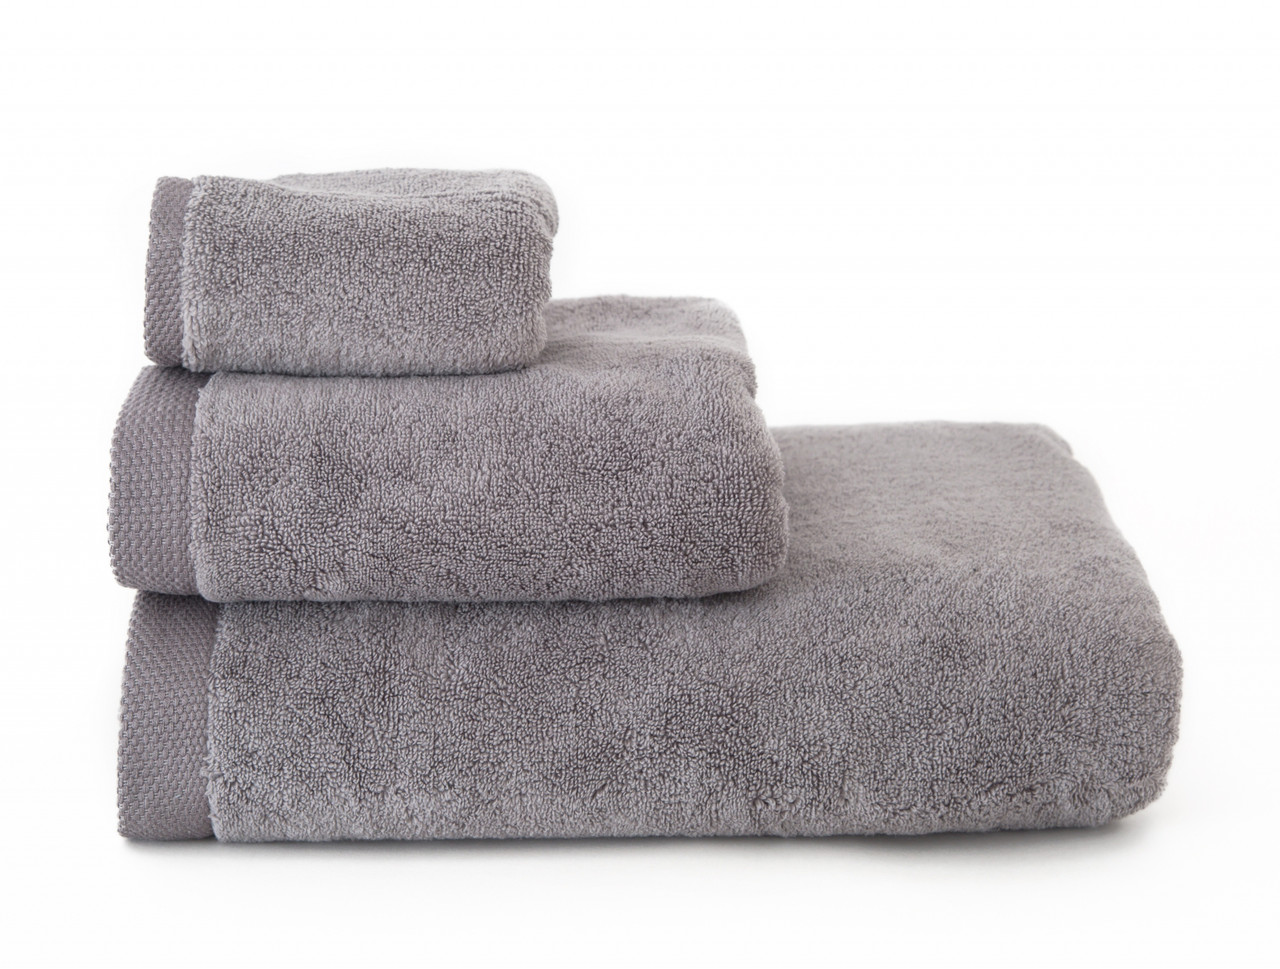 Полотенце махровое Irya 50х90 Comfort microcotton серый